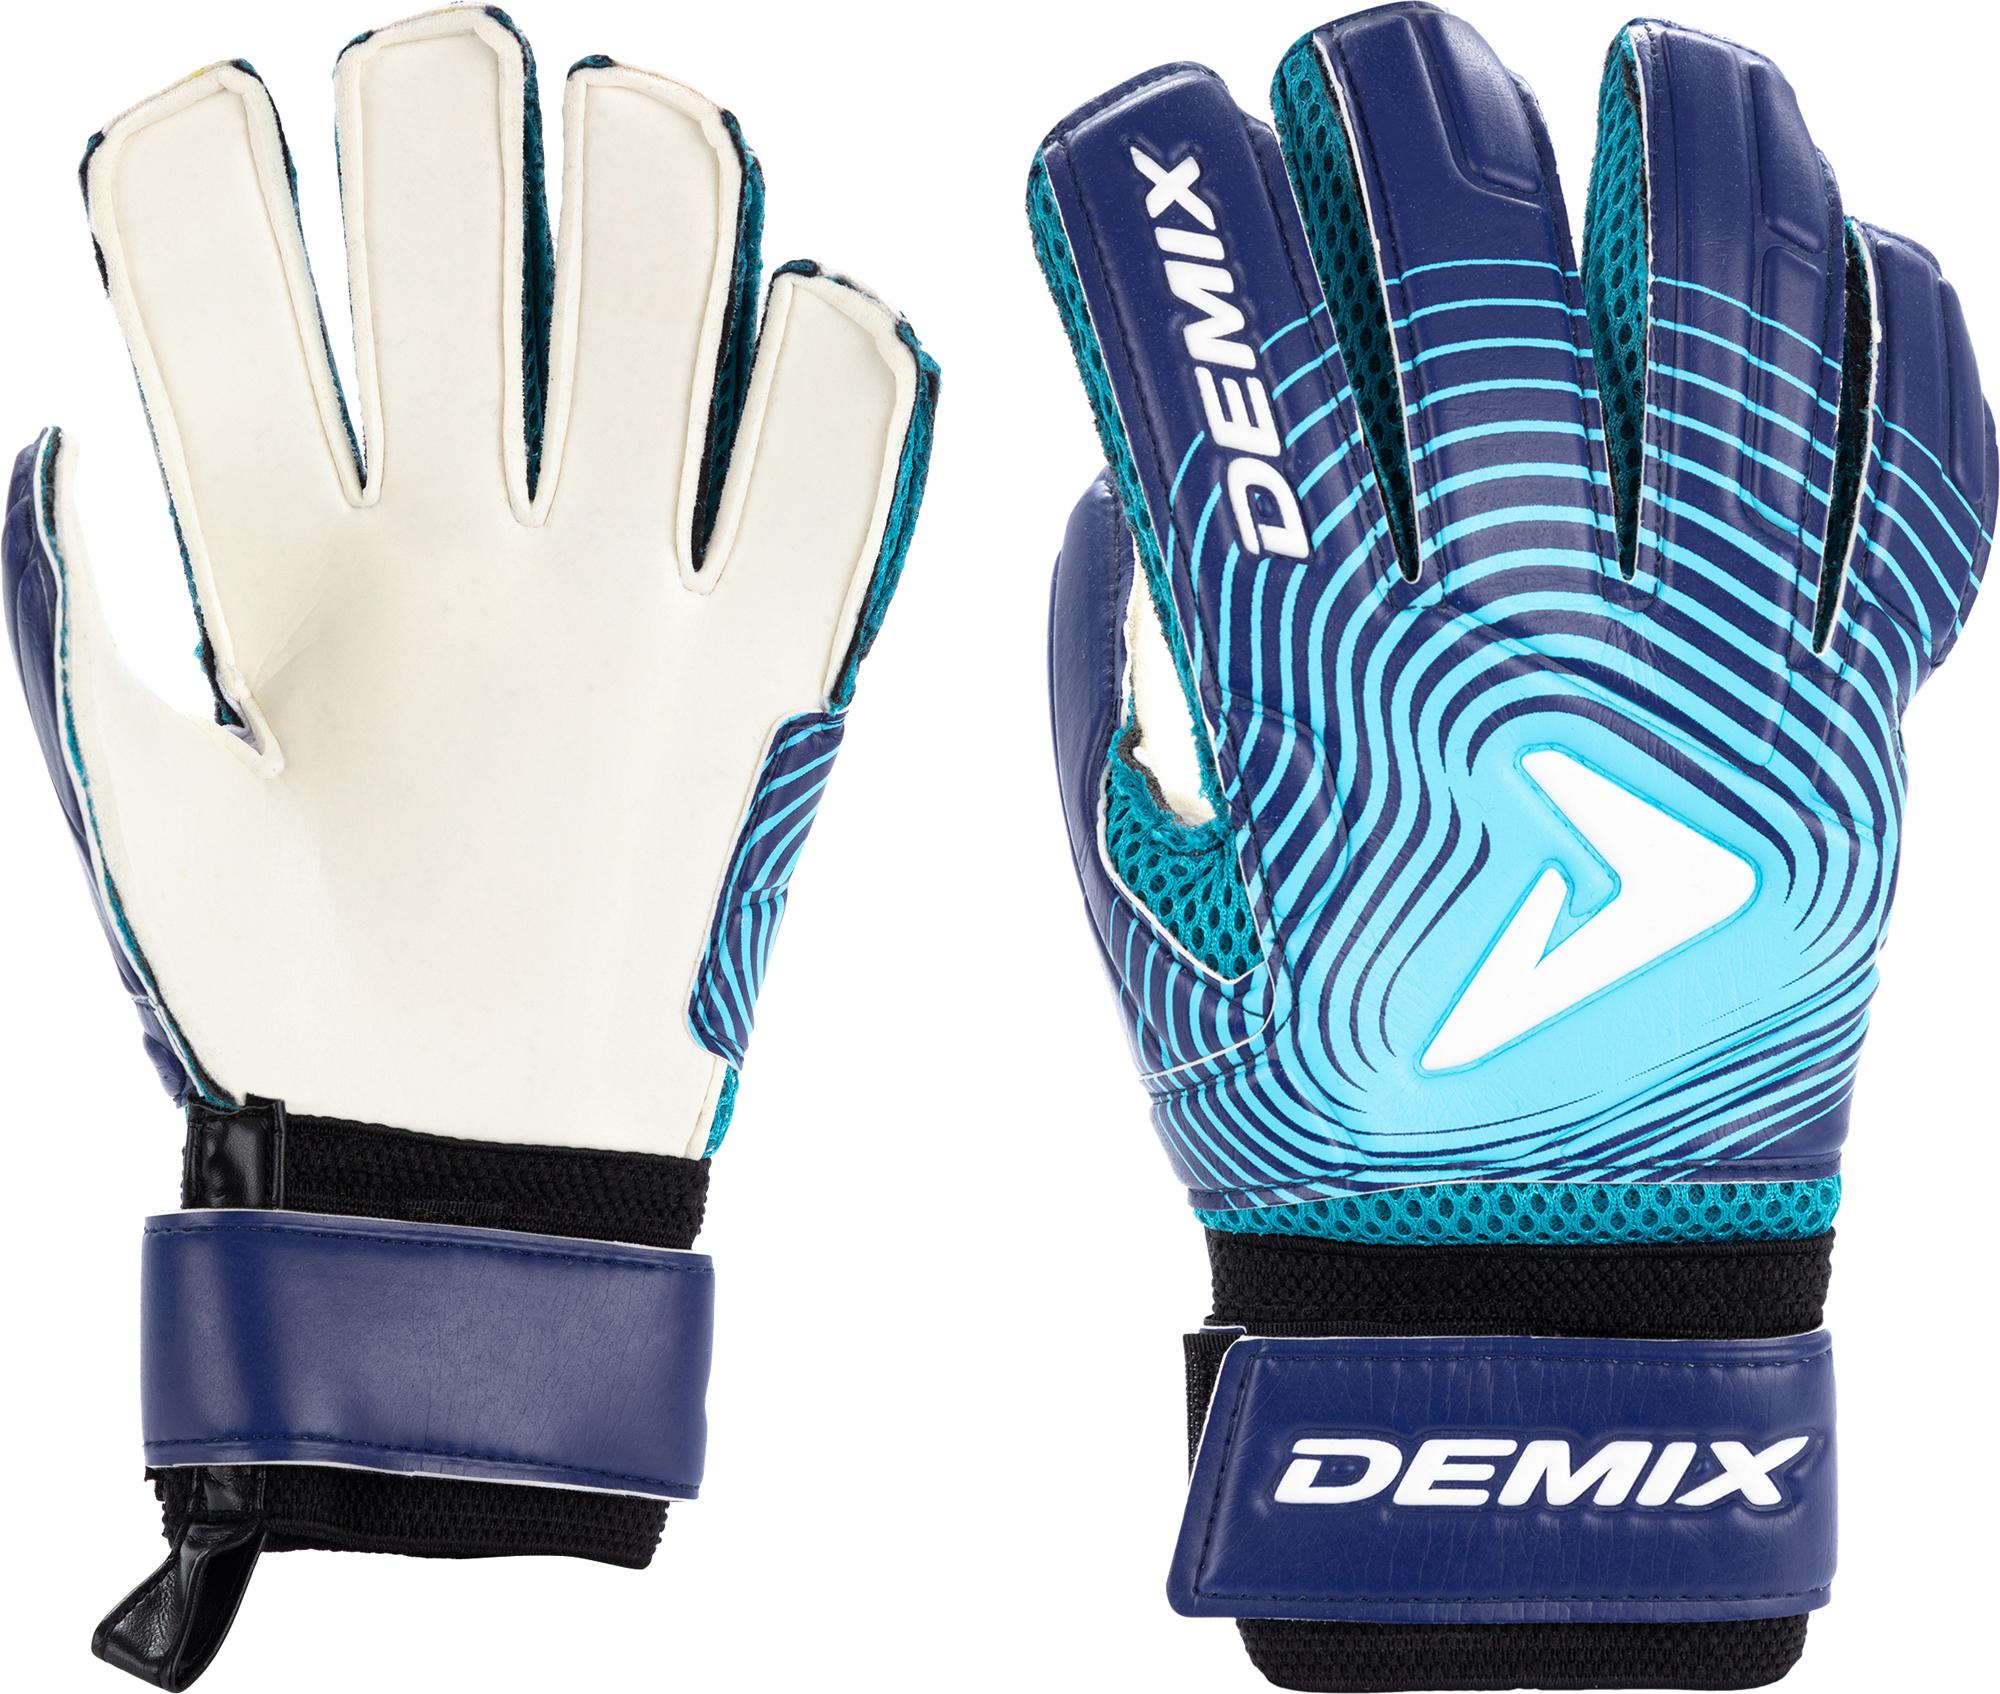 Demix Перчатки вратарские Demix, размер 6